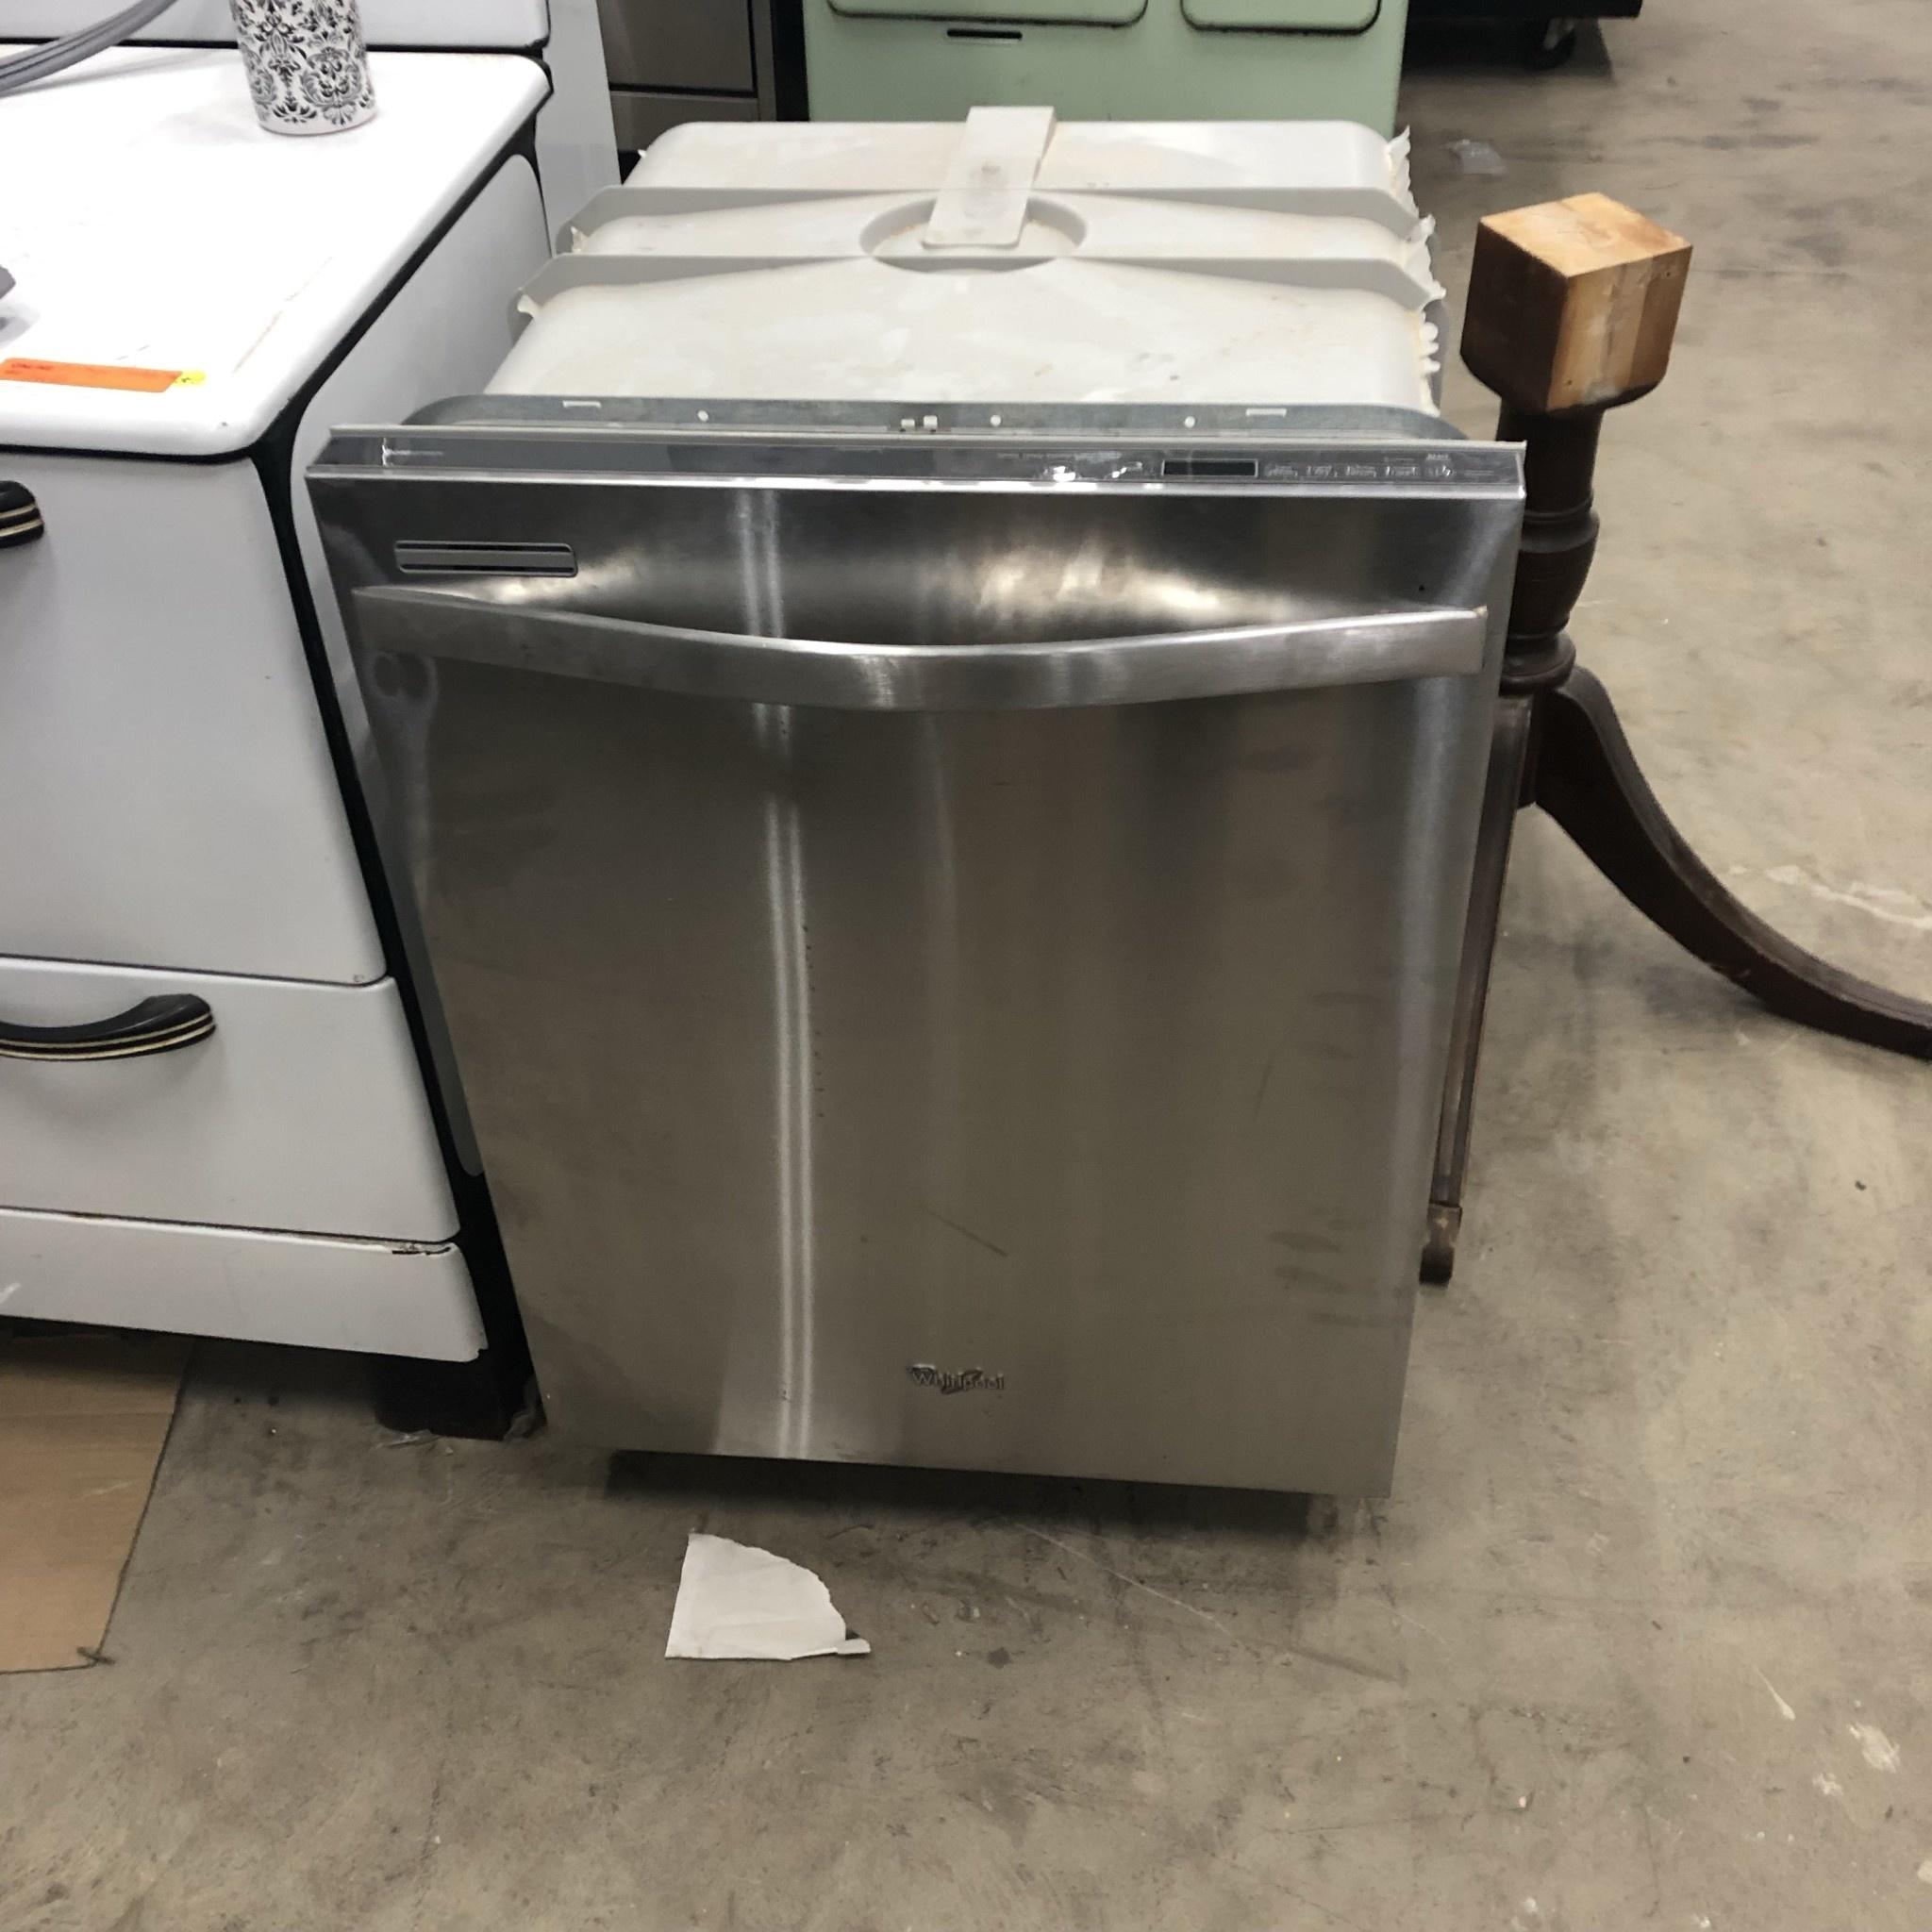 Whirlpool Gold Series Stainless Steel Dishwasher Big Reuse